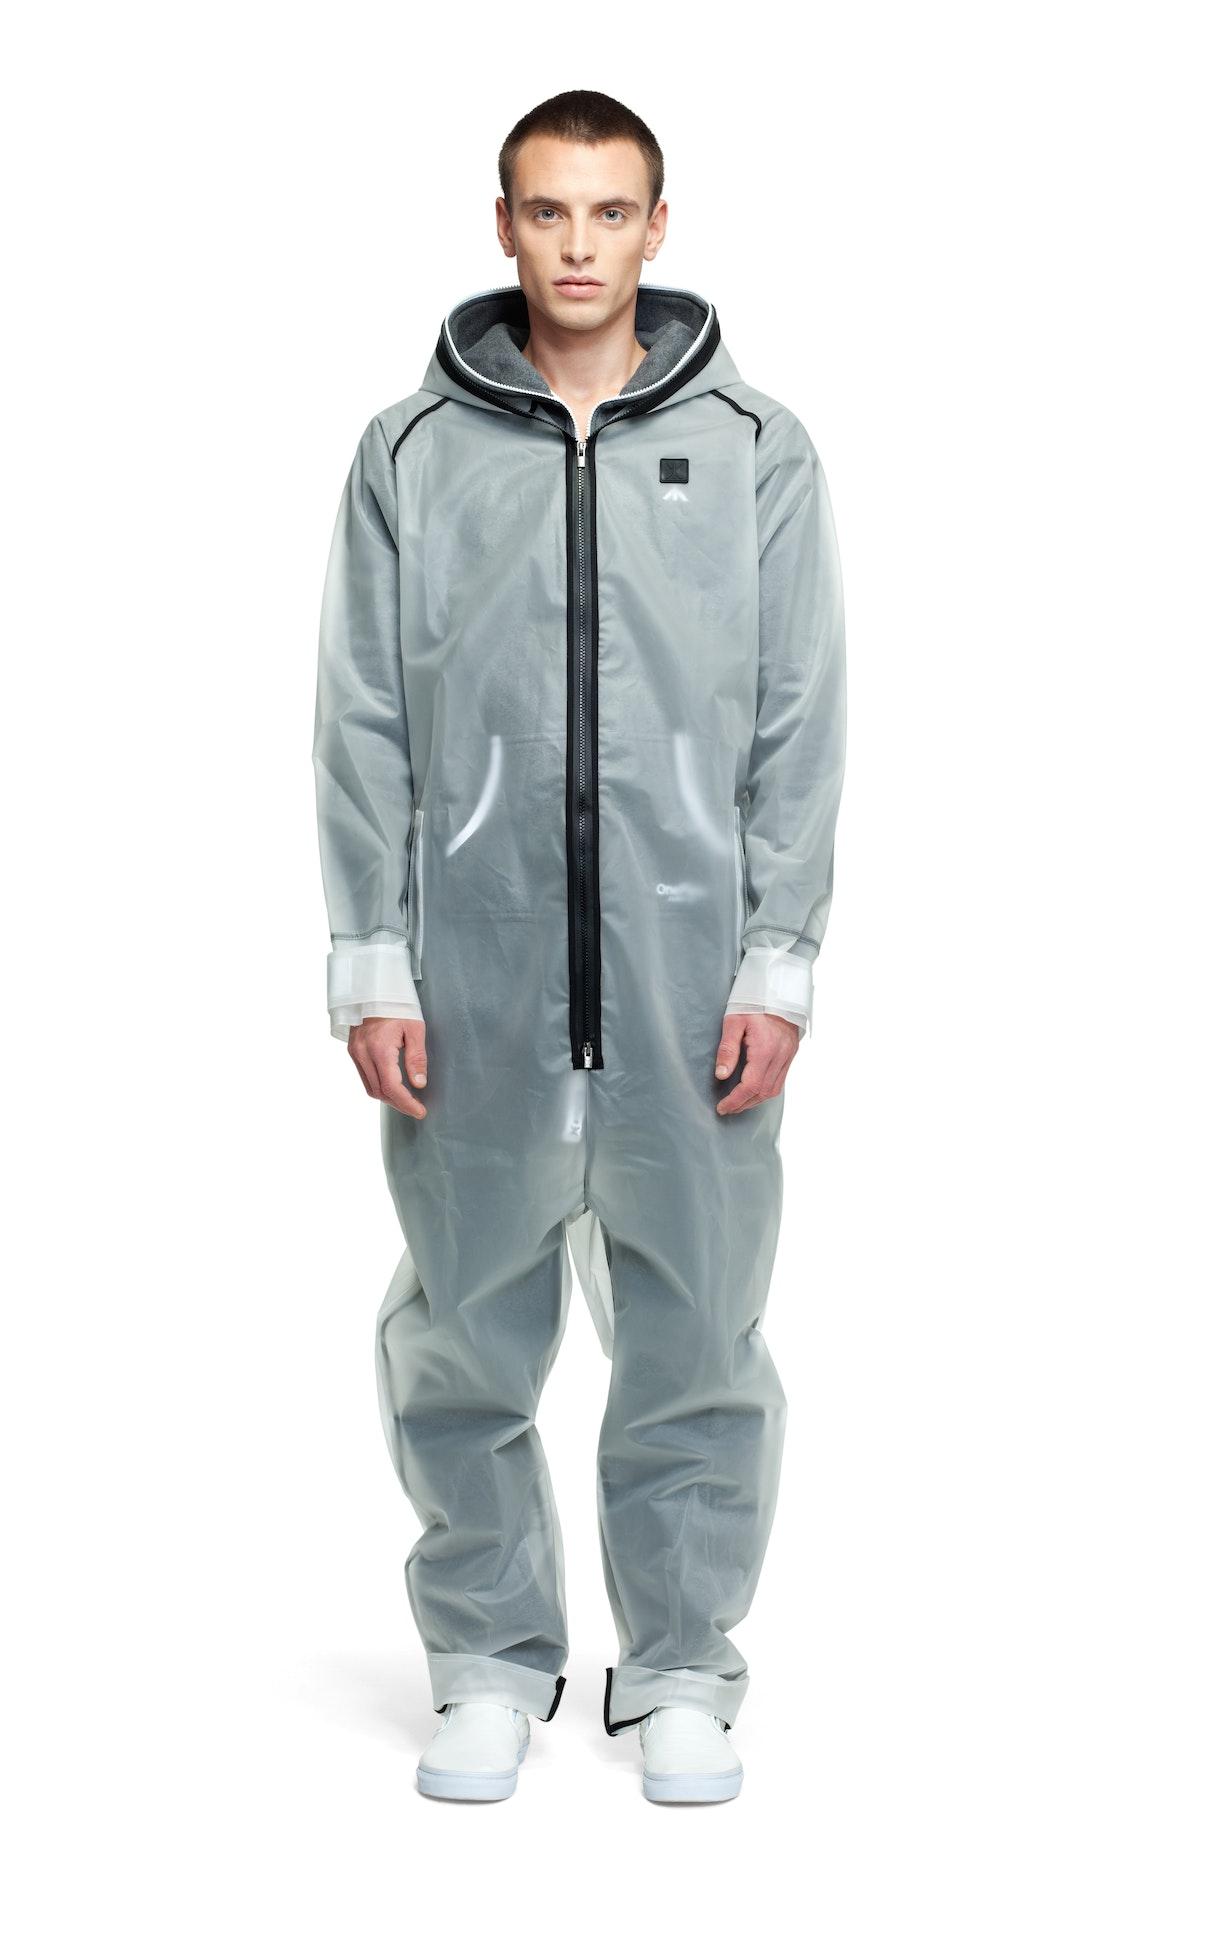 rain jumpsuit transparent frosted onesie onepiece us. Black Bedroom Furniture Sets. Home Design Ideas